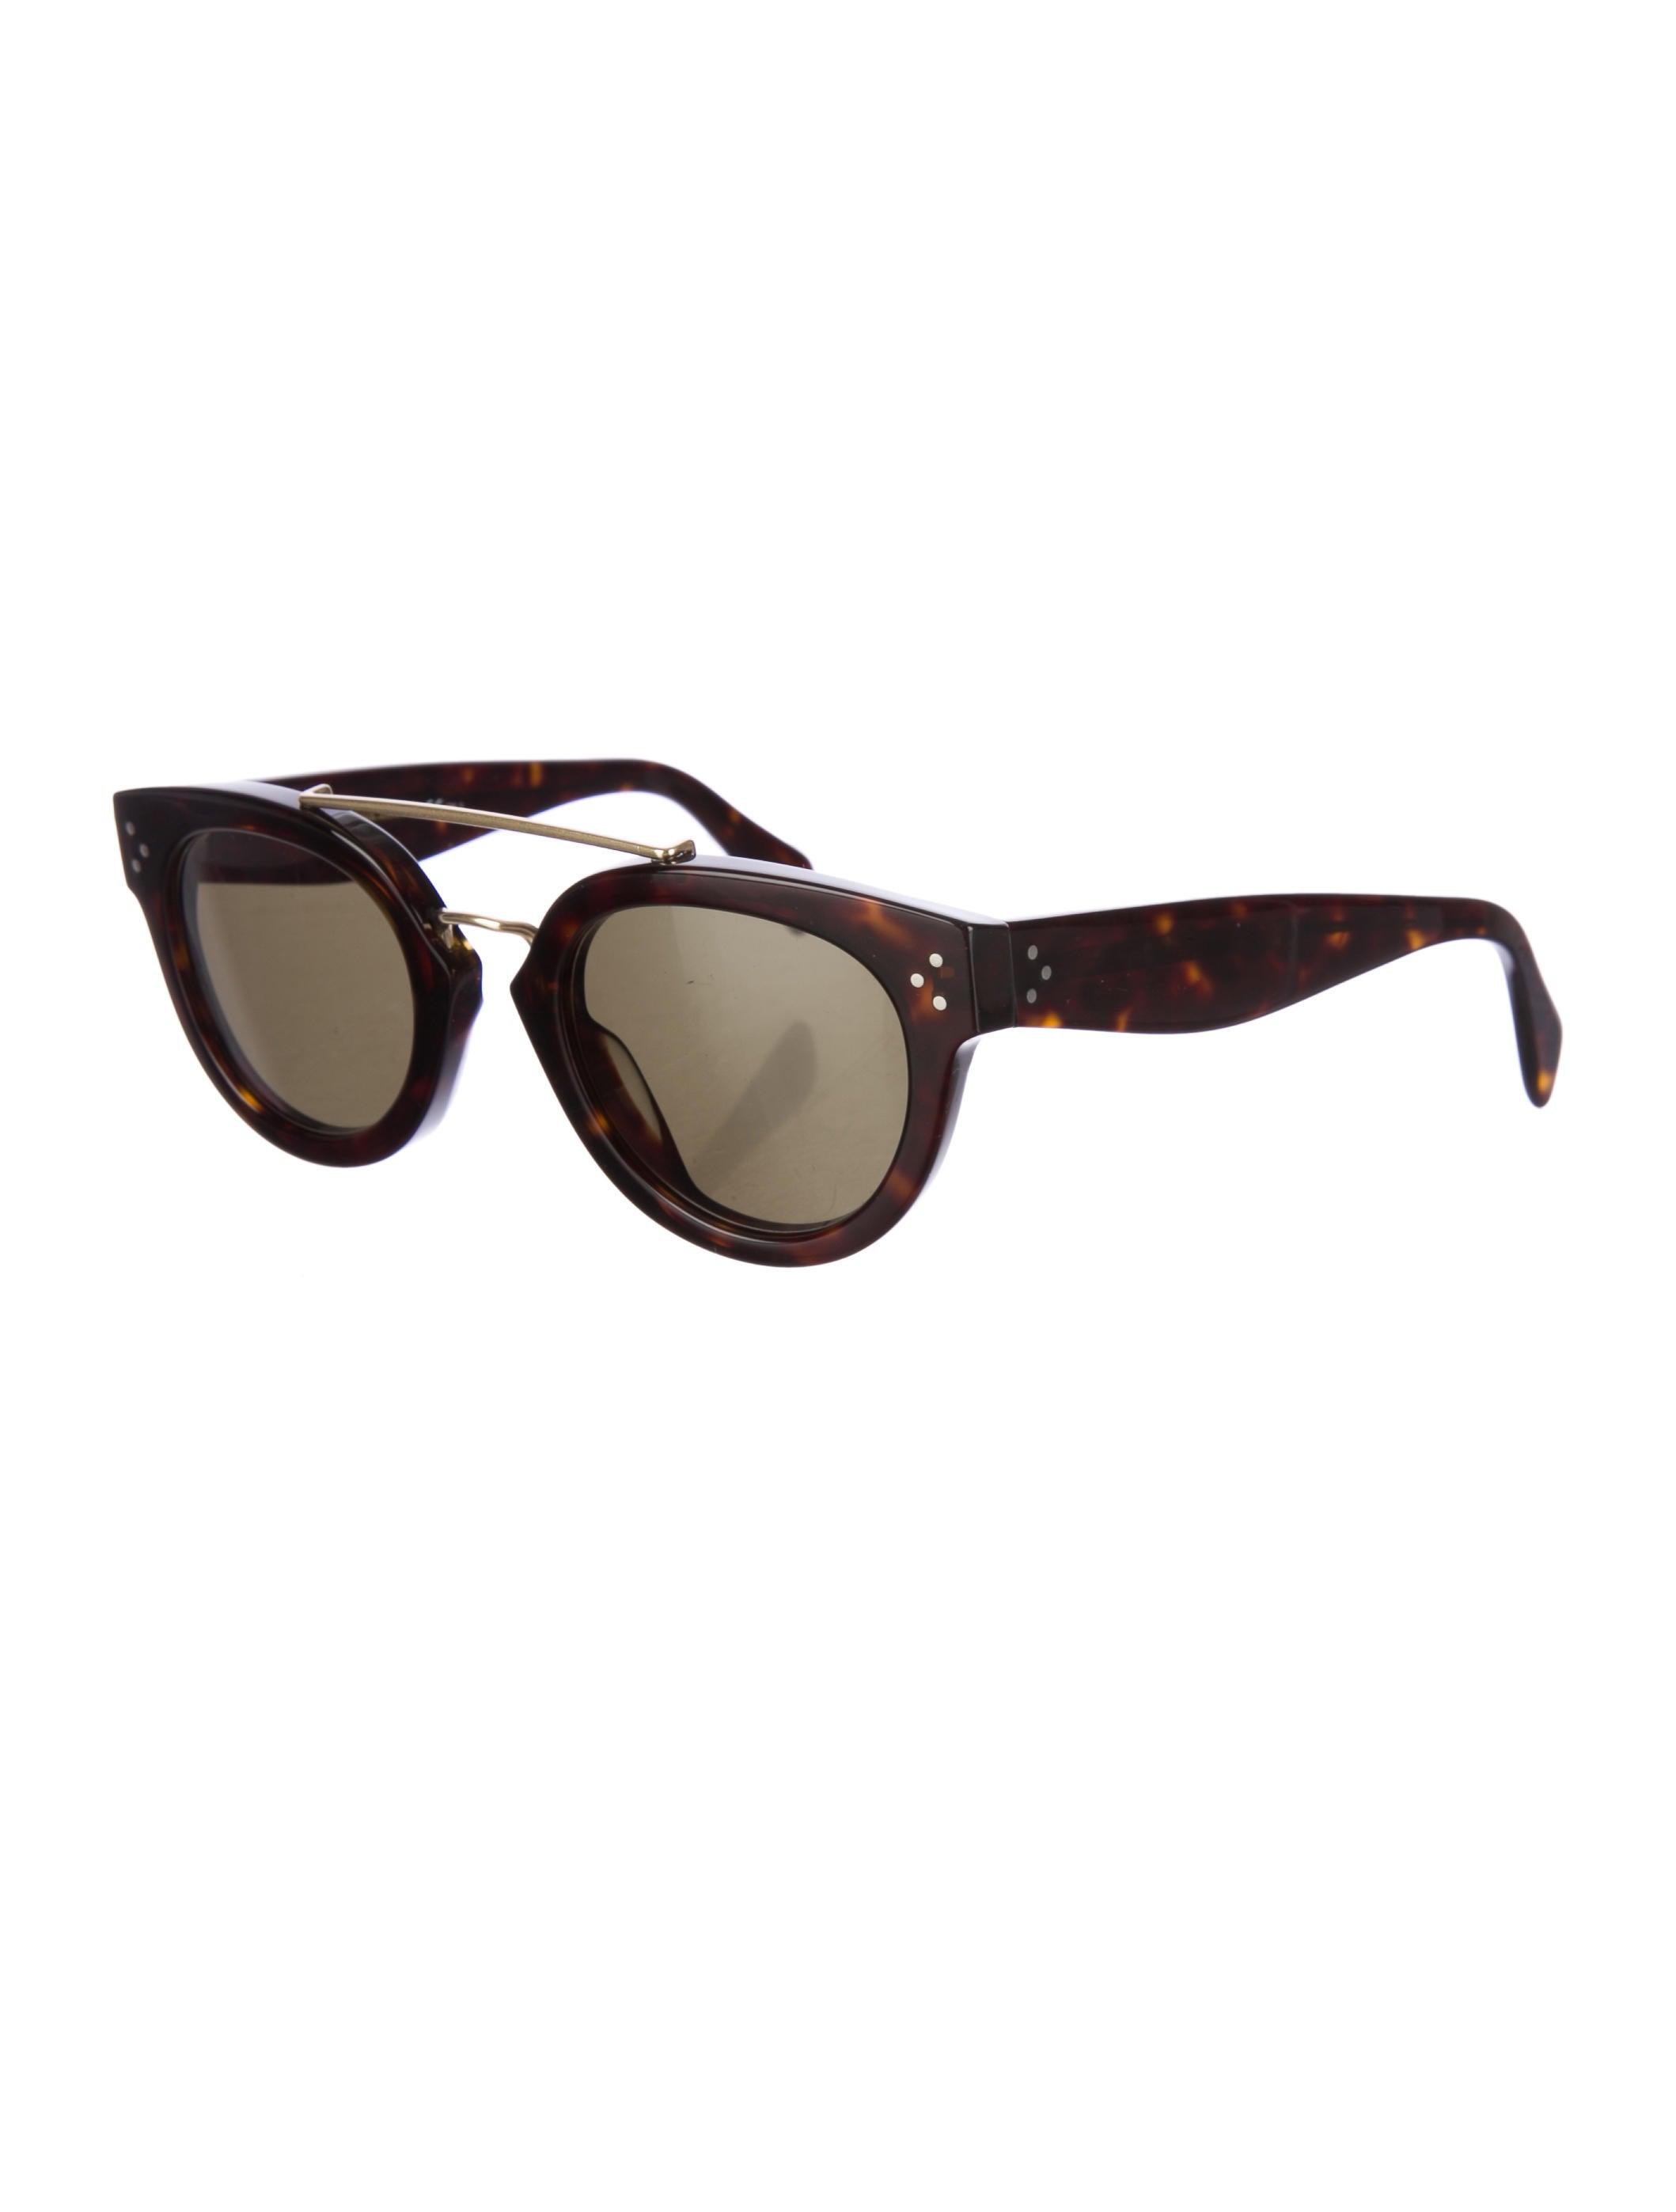 cc58f9c5ef44 Céline Sunglasses - Accessories - CEL29338